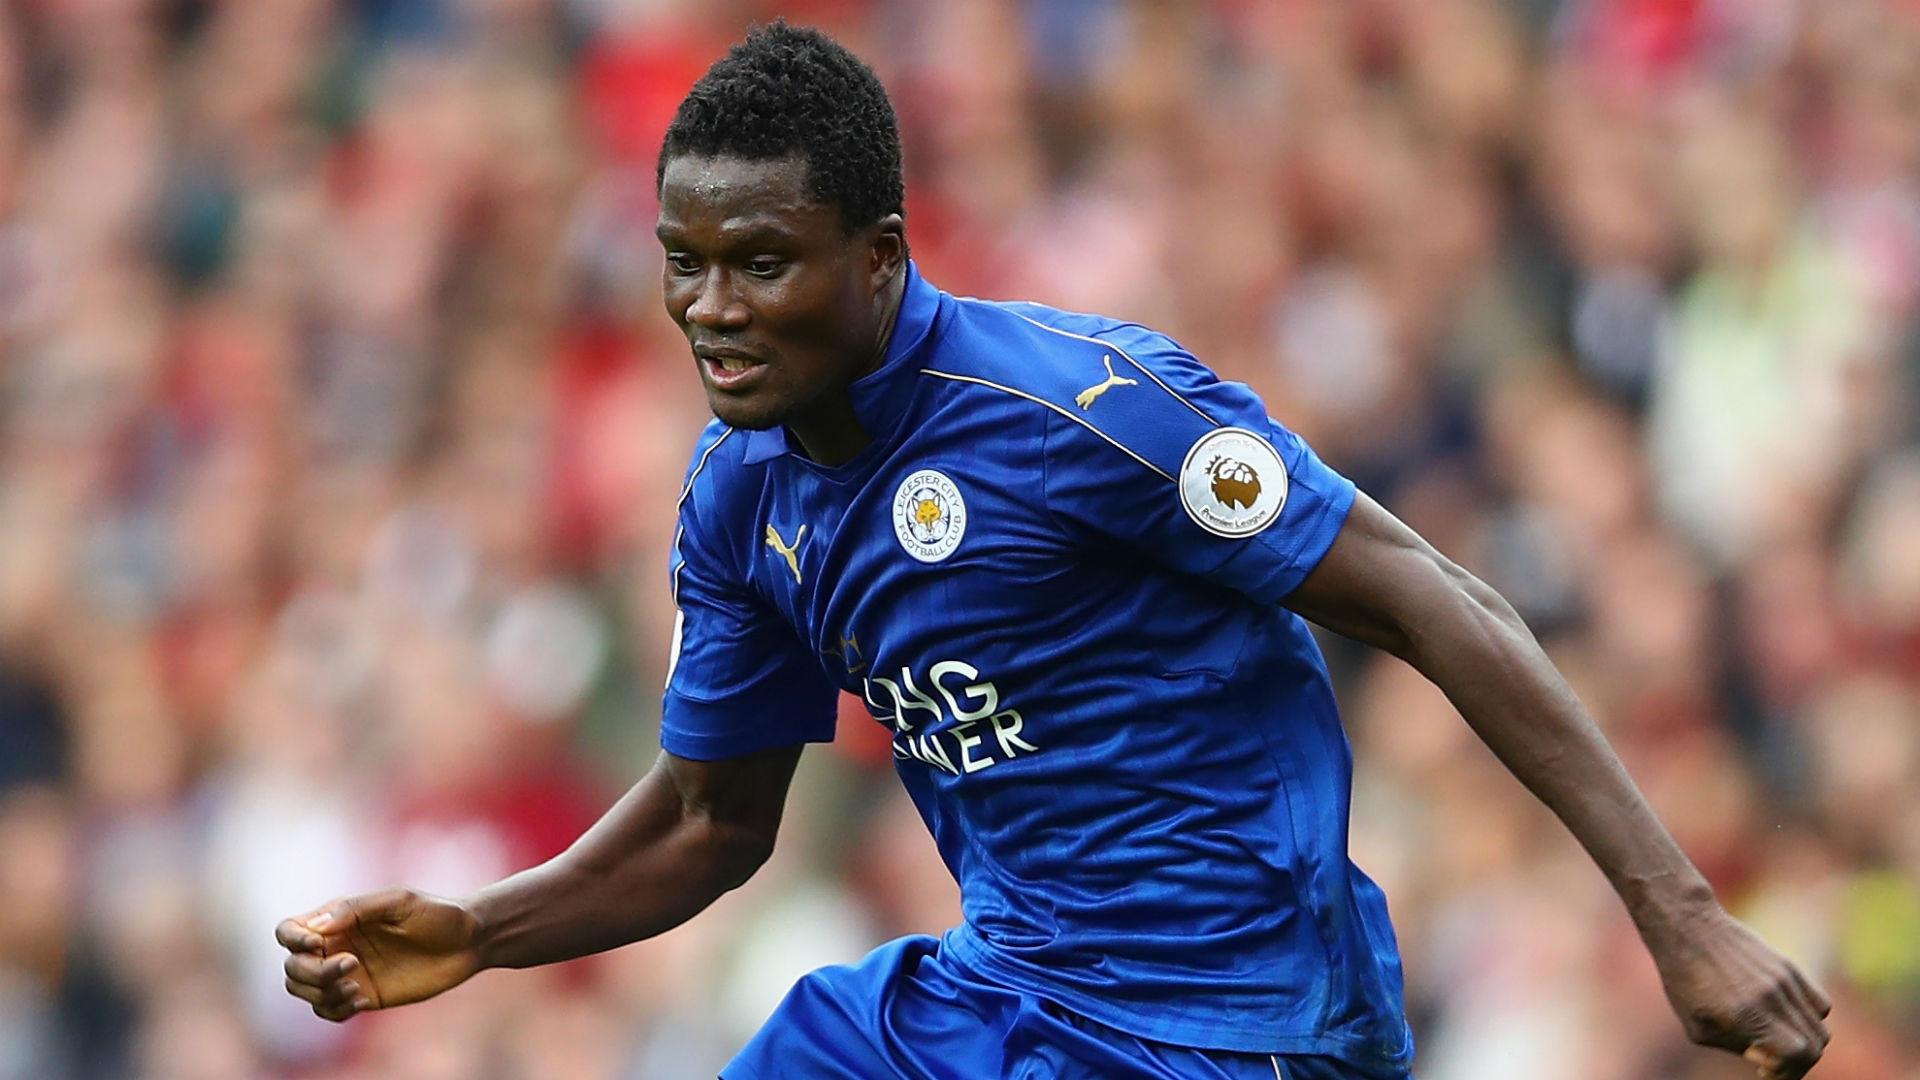 Daniel Amartey - Leicester City